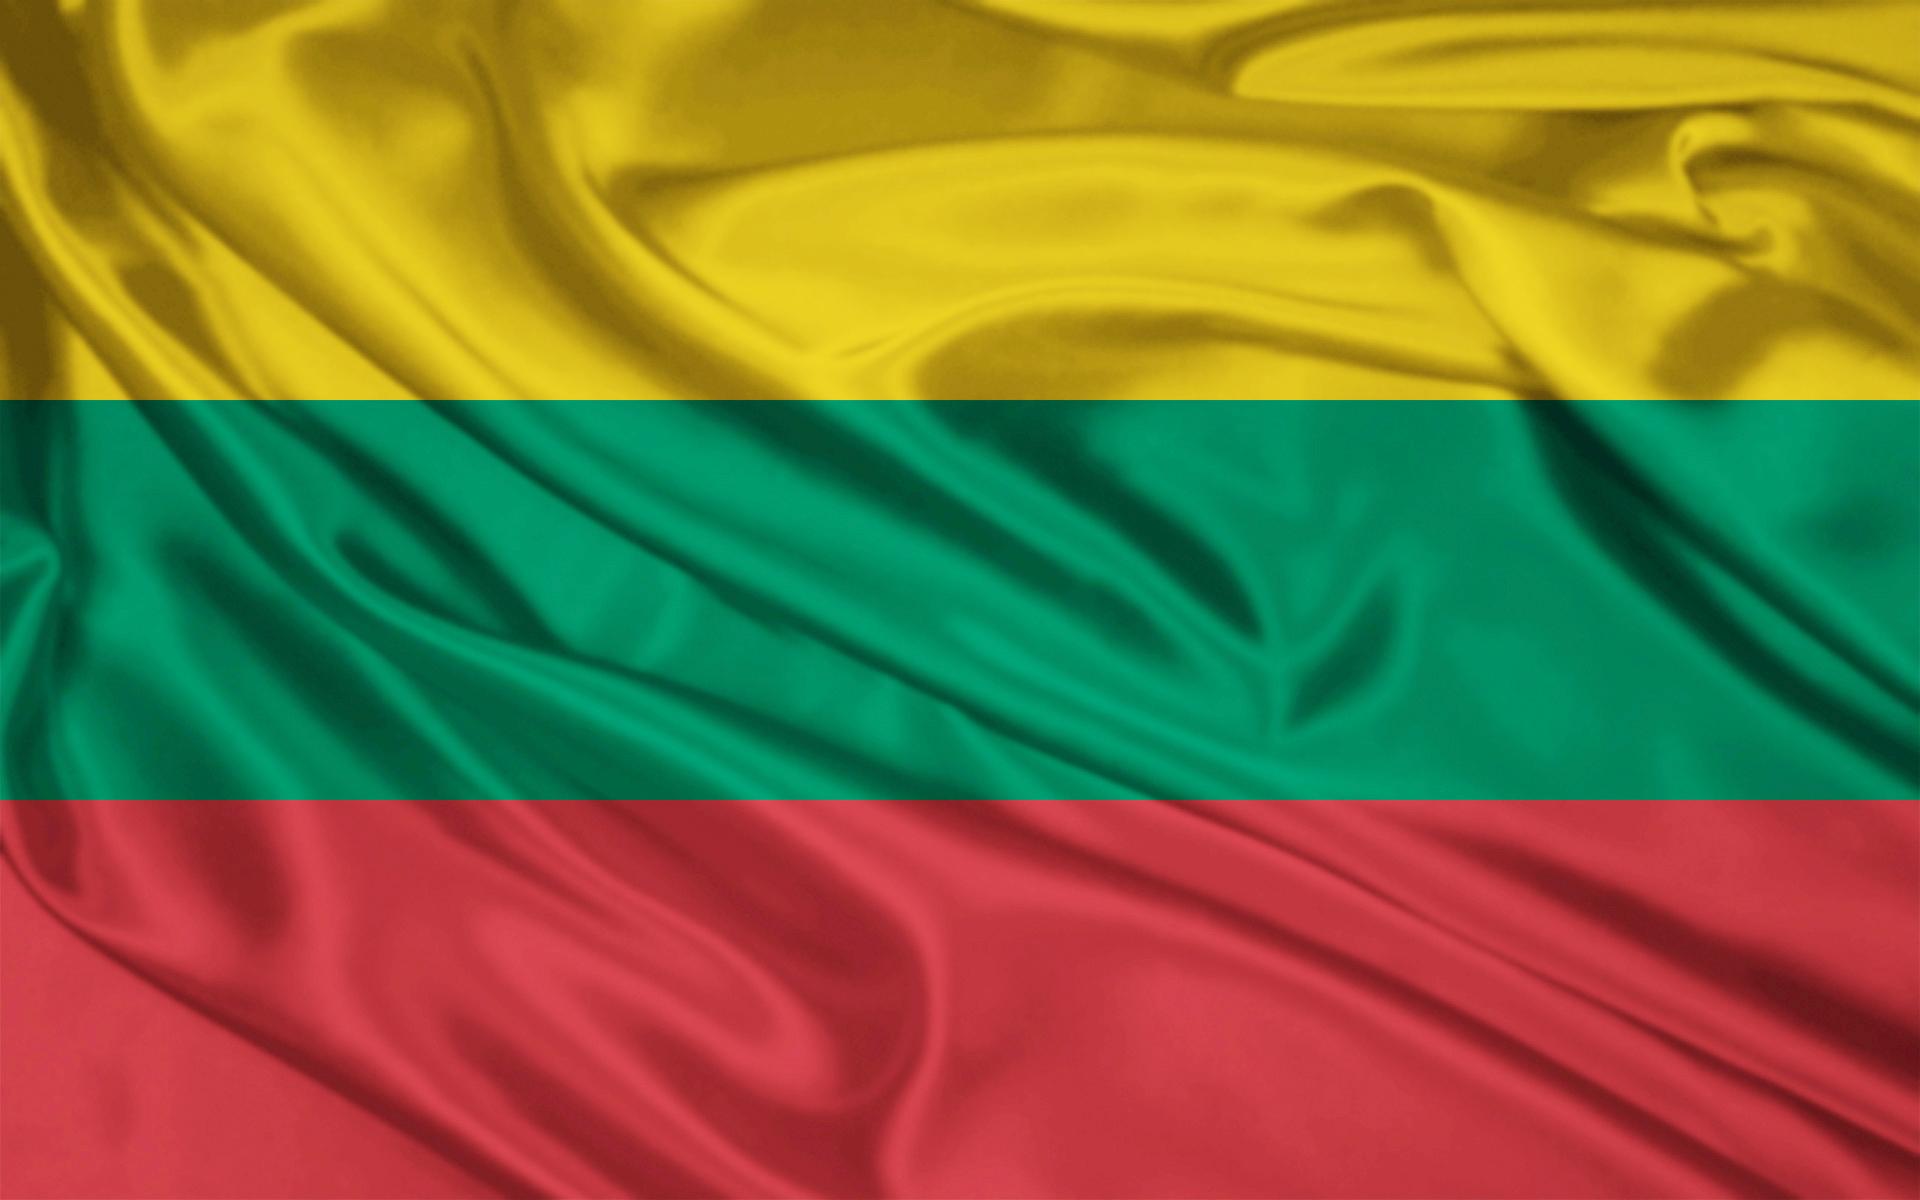 National Flag of Lithuania Pics